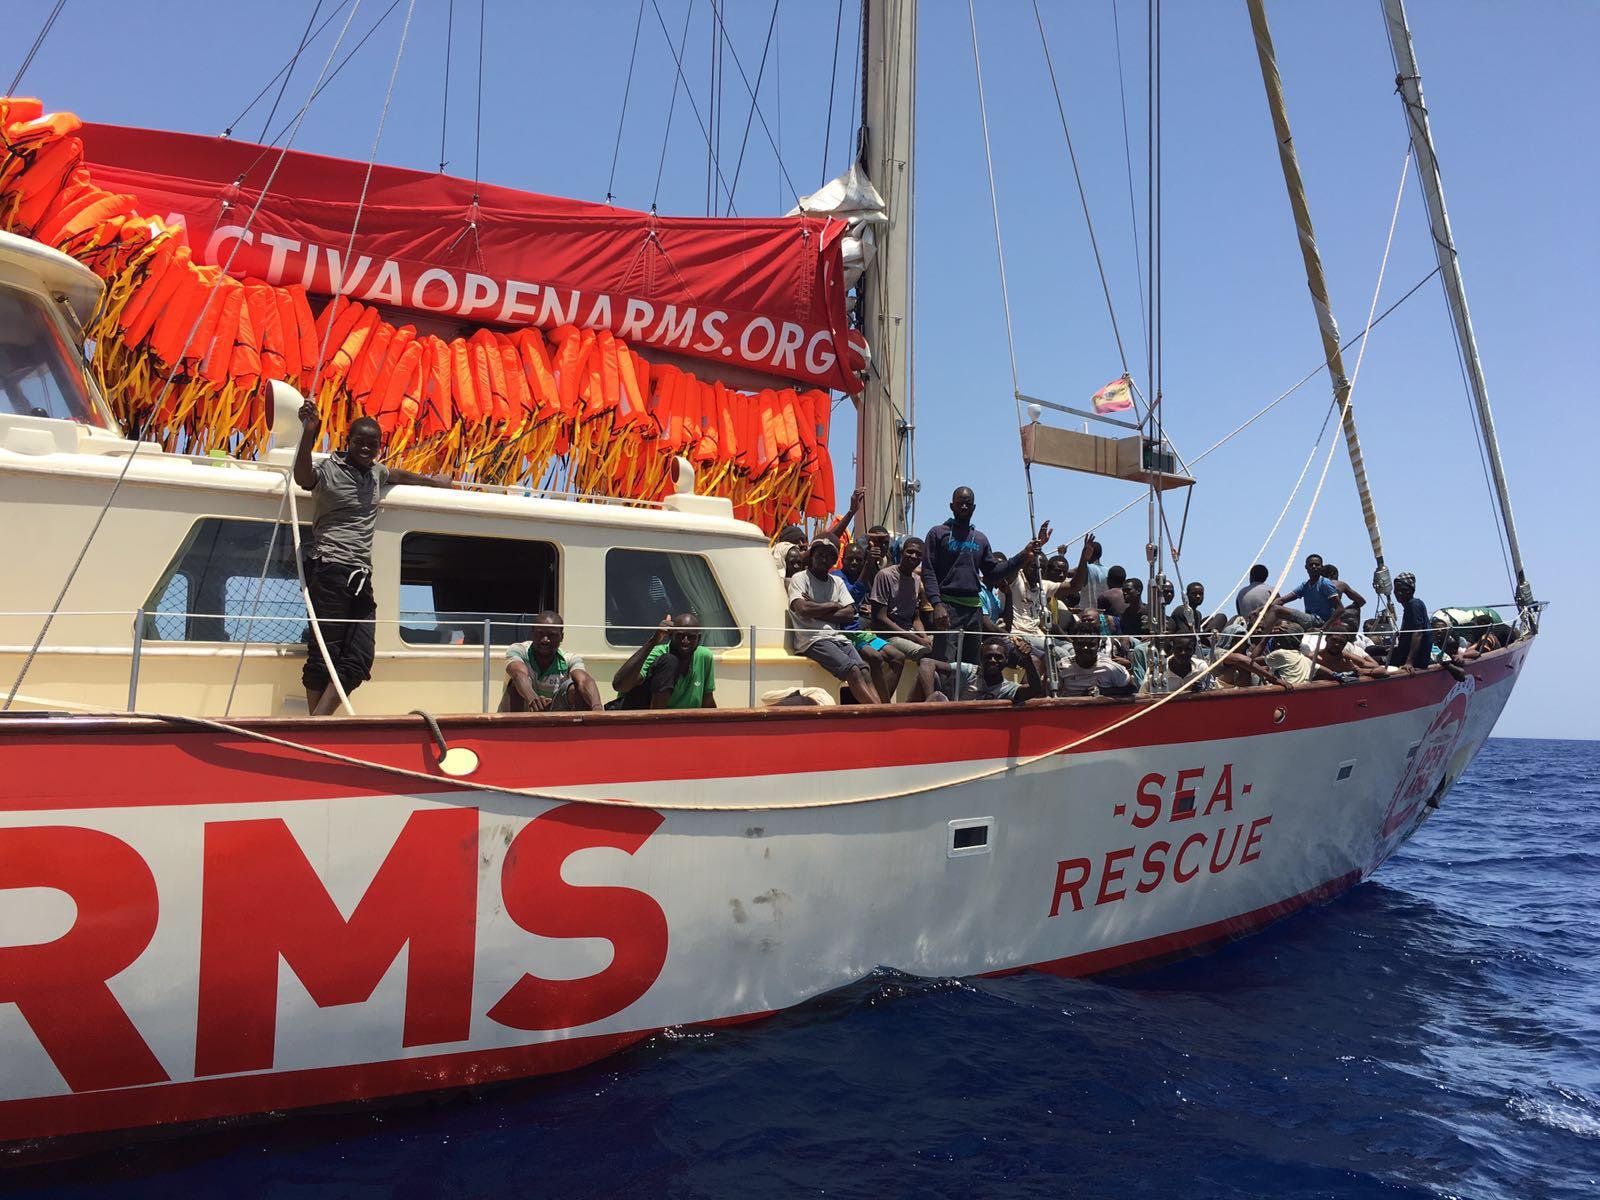 spanish-lifesavers-saving-refugees-in-libya